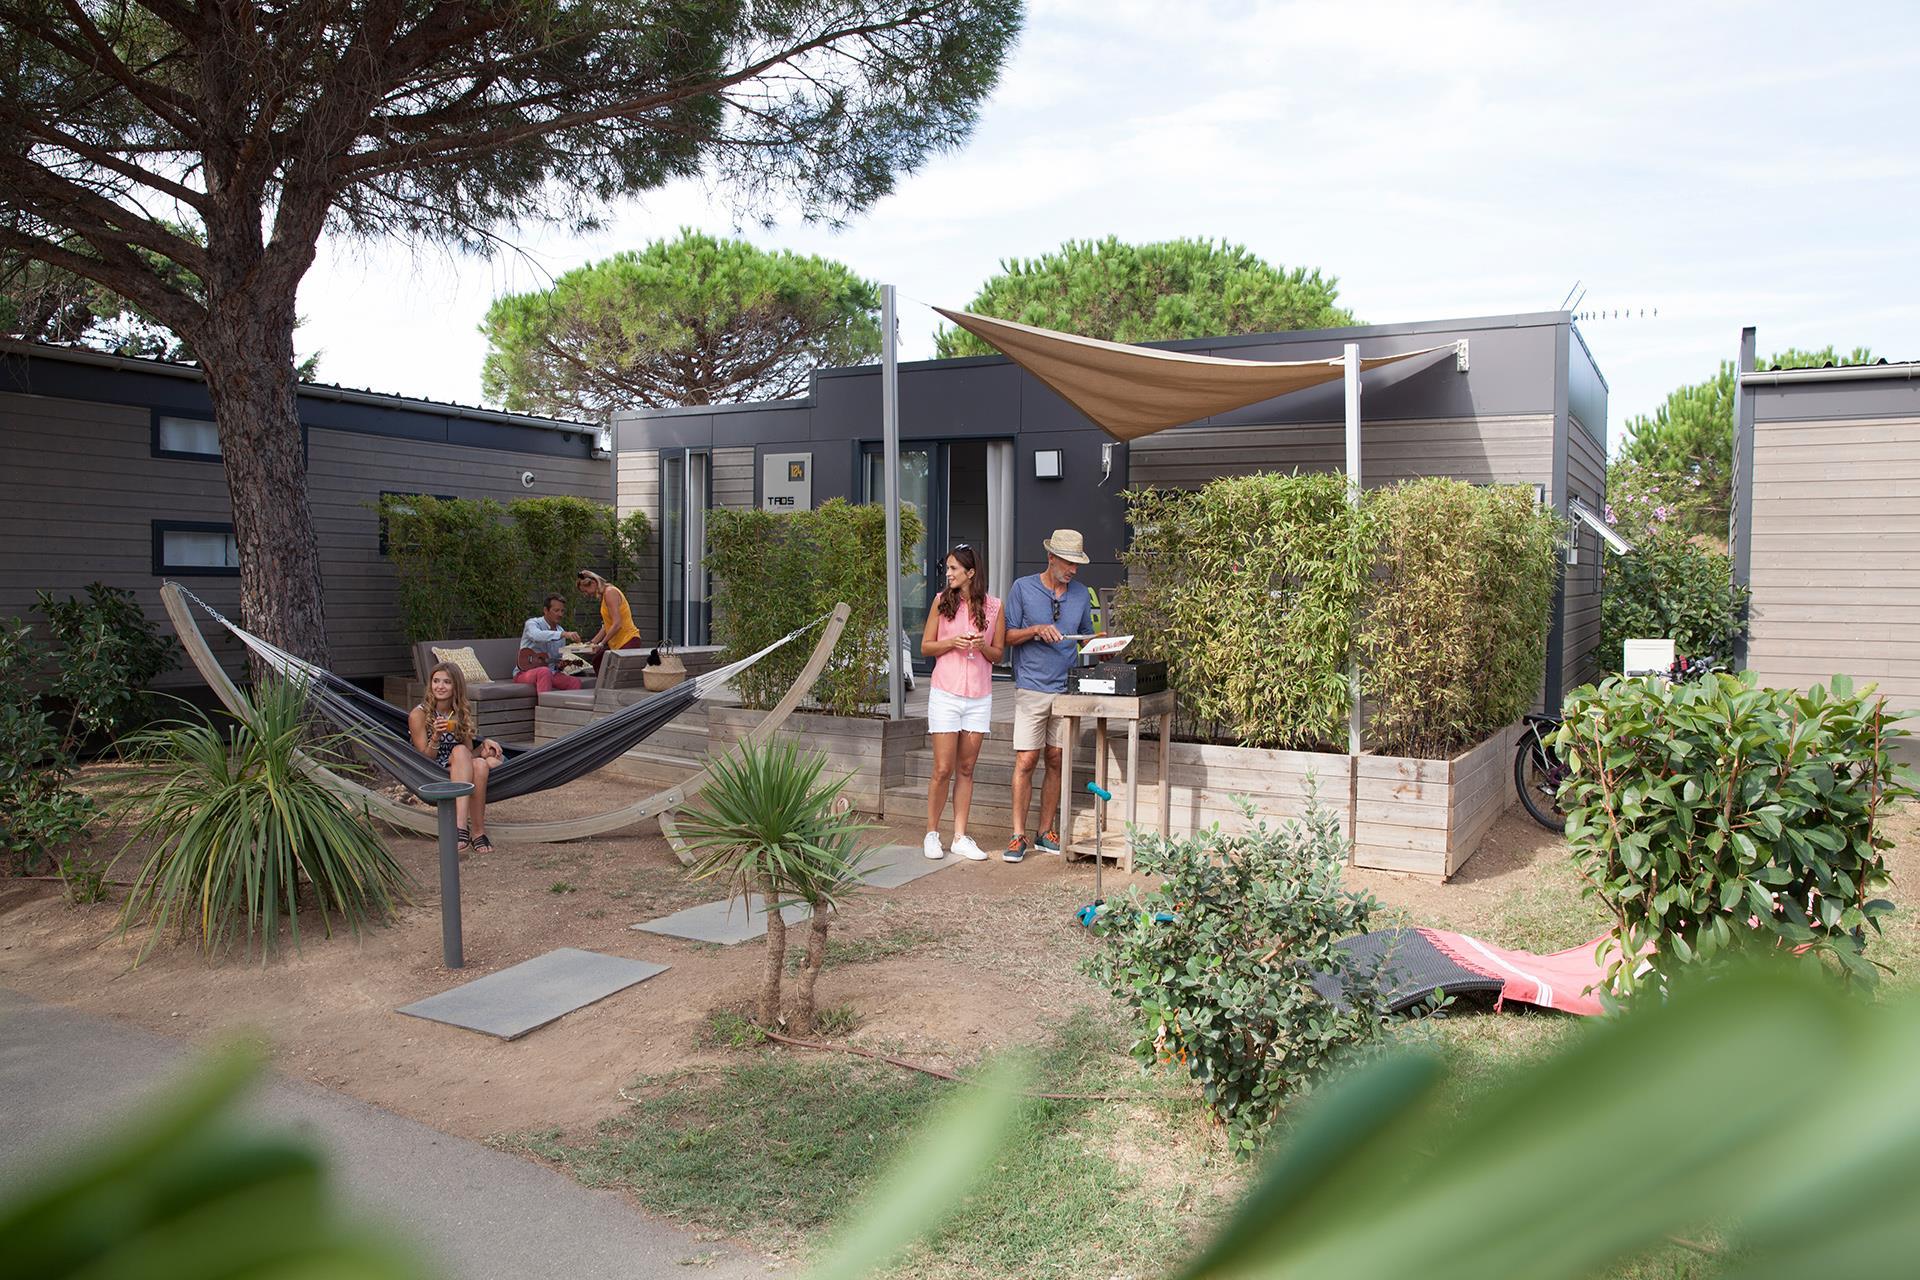 Camping Domaine de la Dragonniere, Vias, Hérault